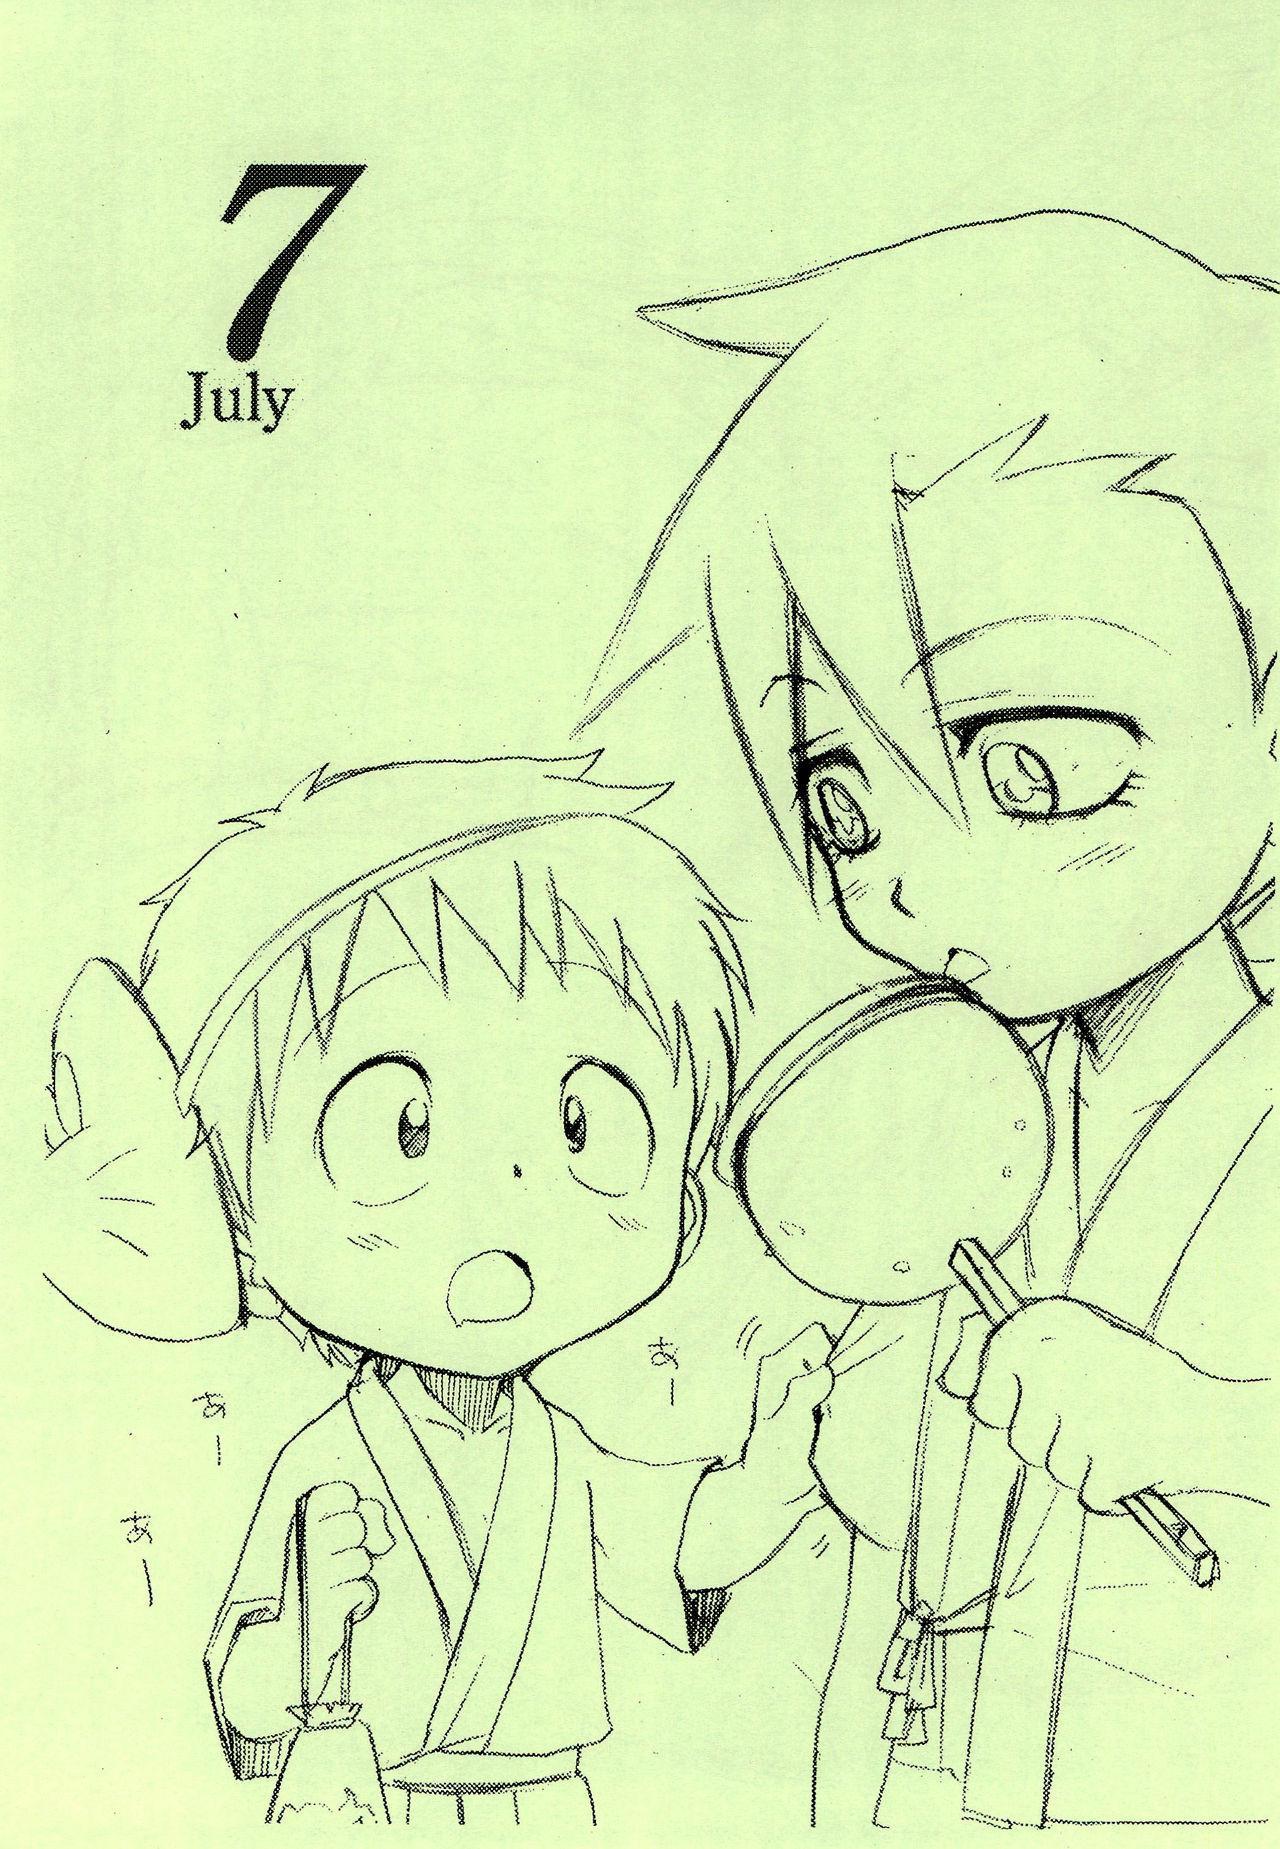 (C72) [Shamon Tei (Shamon)] KamiShimo to Ichinenjuu 2007-nen 9-gatsu - 2008-nen 8-gatsu Calendar (Gurren Lagann) 11